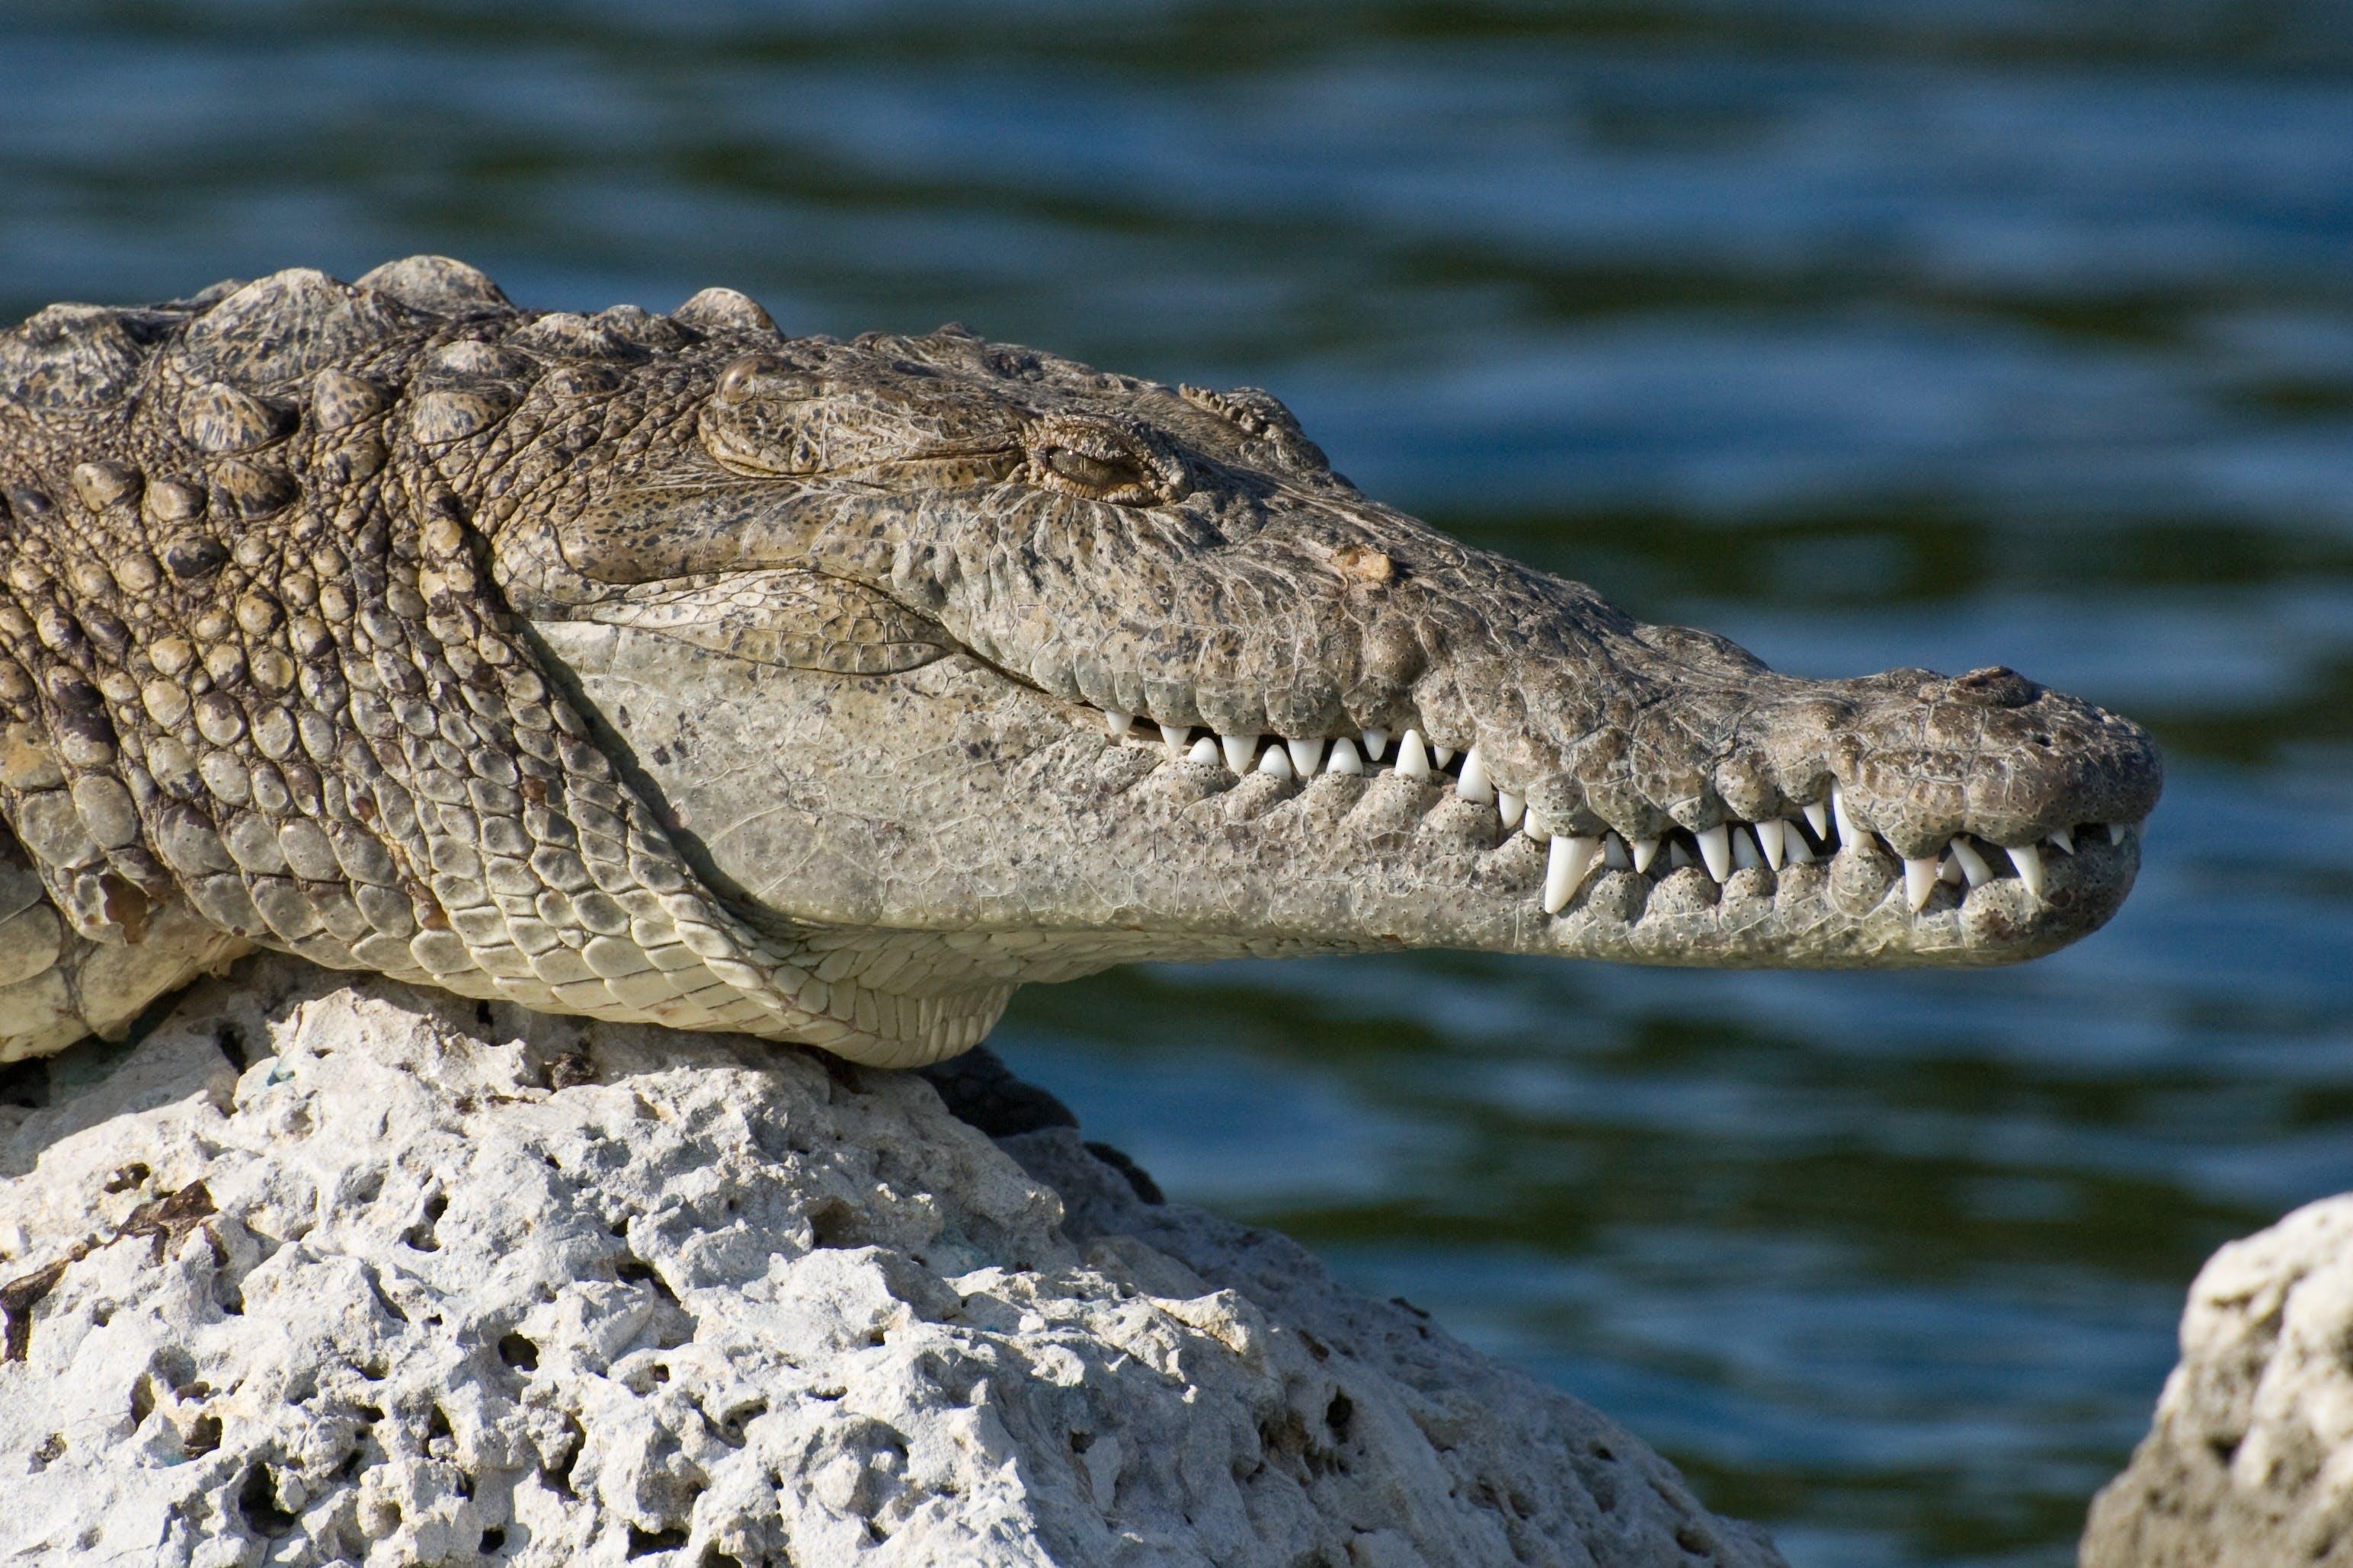 Free stock photo of water, animal, reptile, wildlife